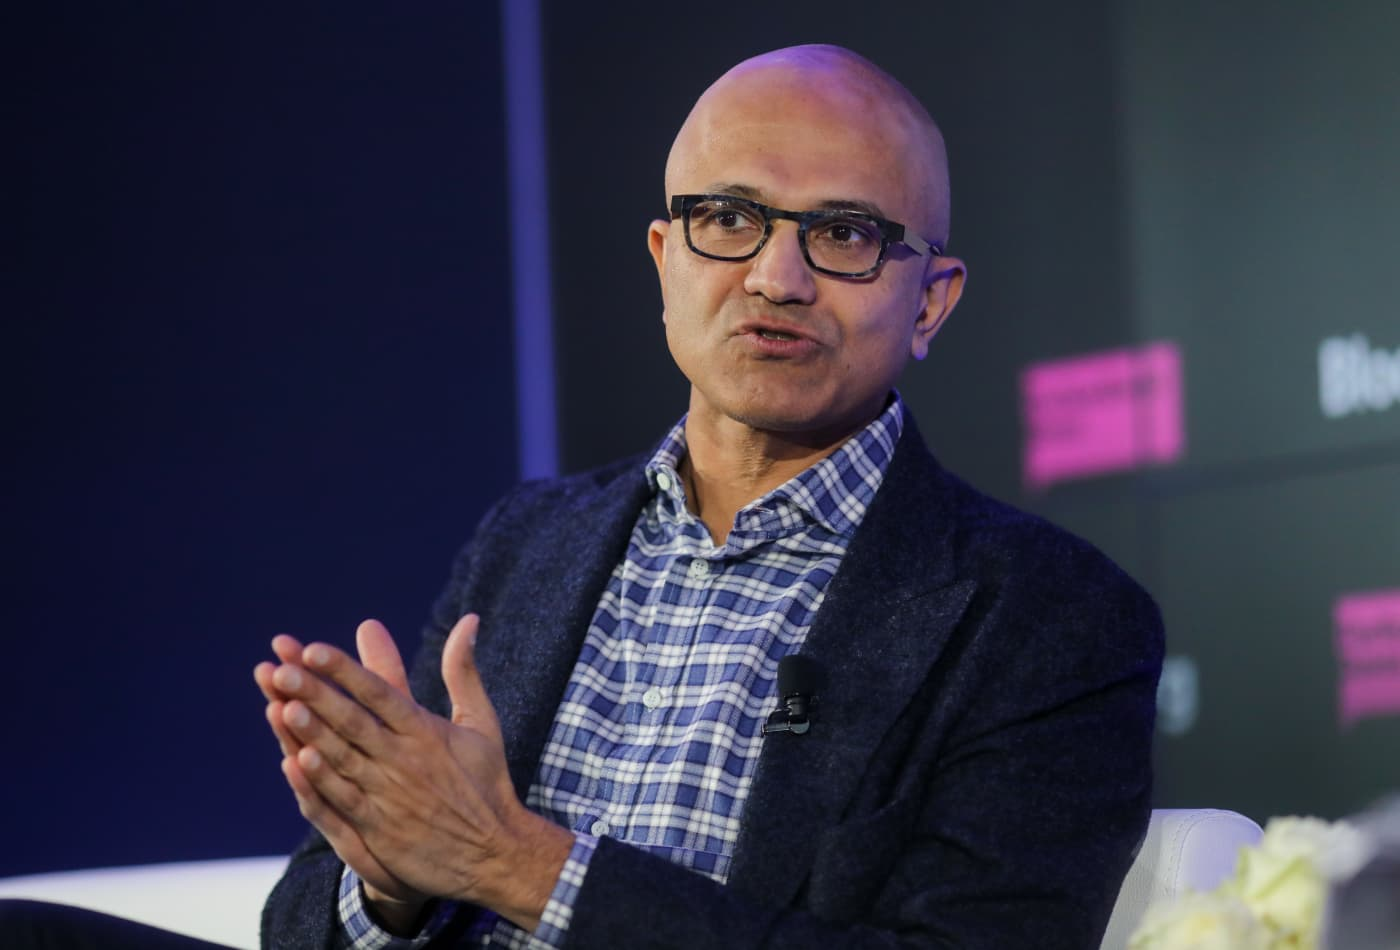 Microsoft CEO Satya Nadella: Saying 'my team is great and everyone else sucks' is not leadership